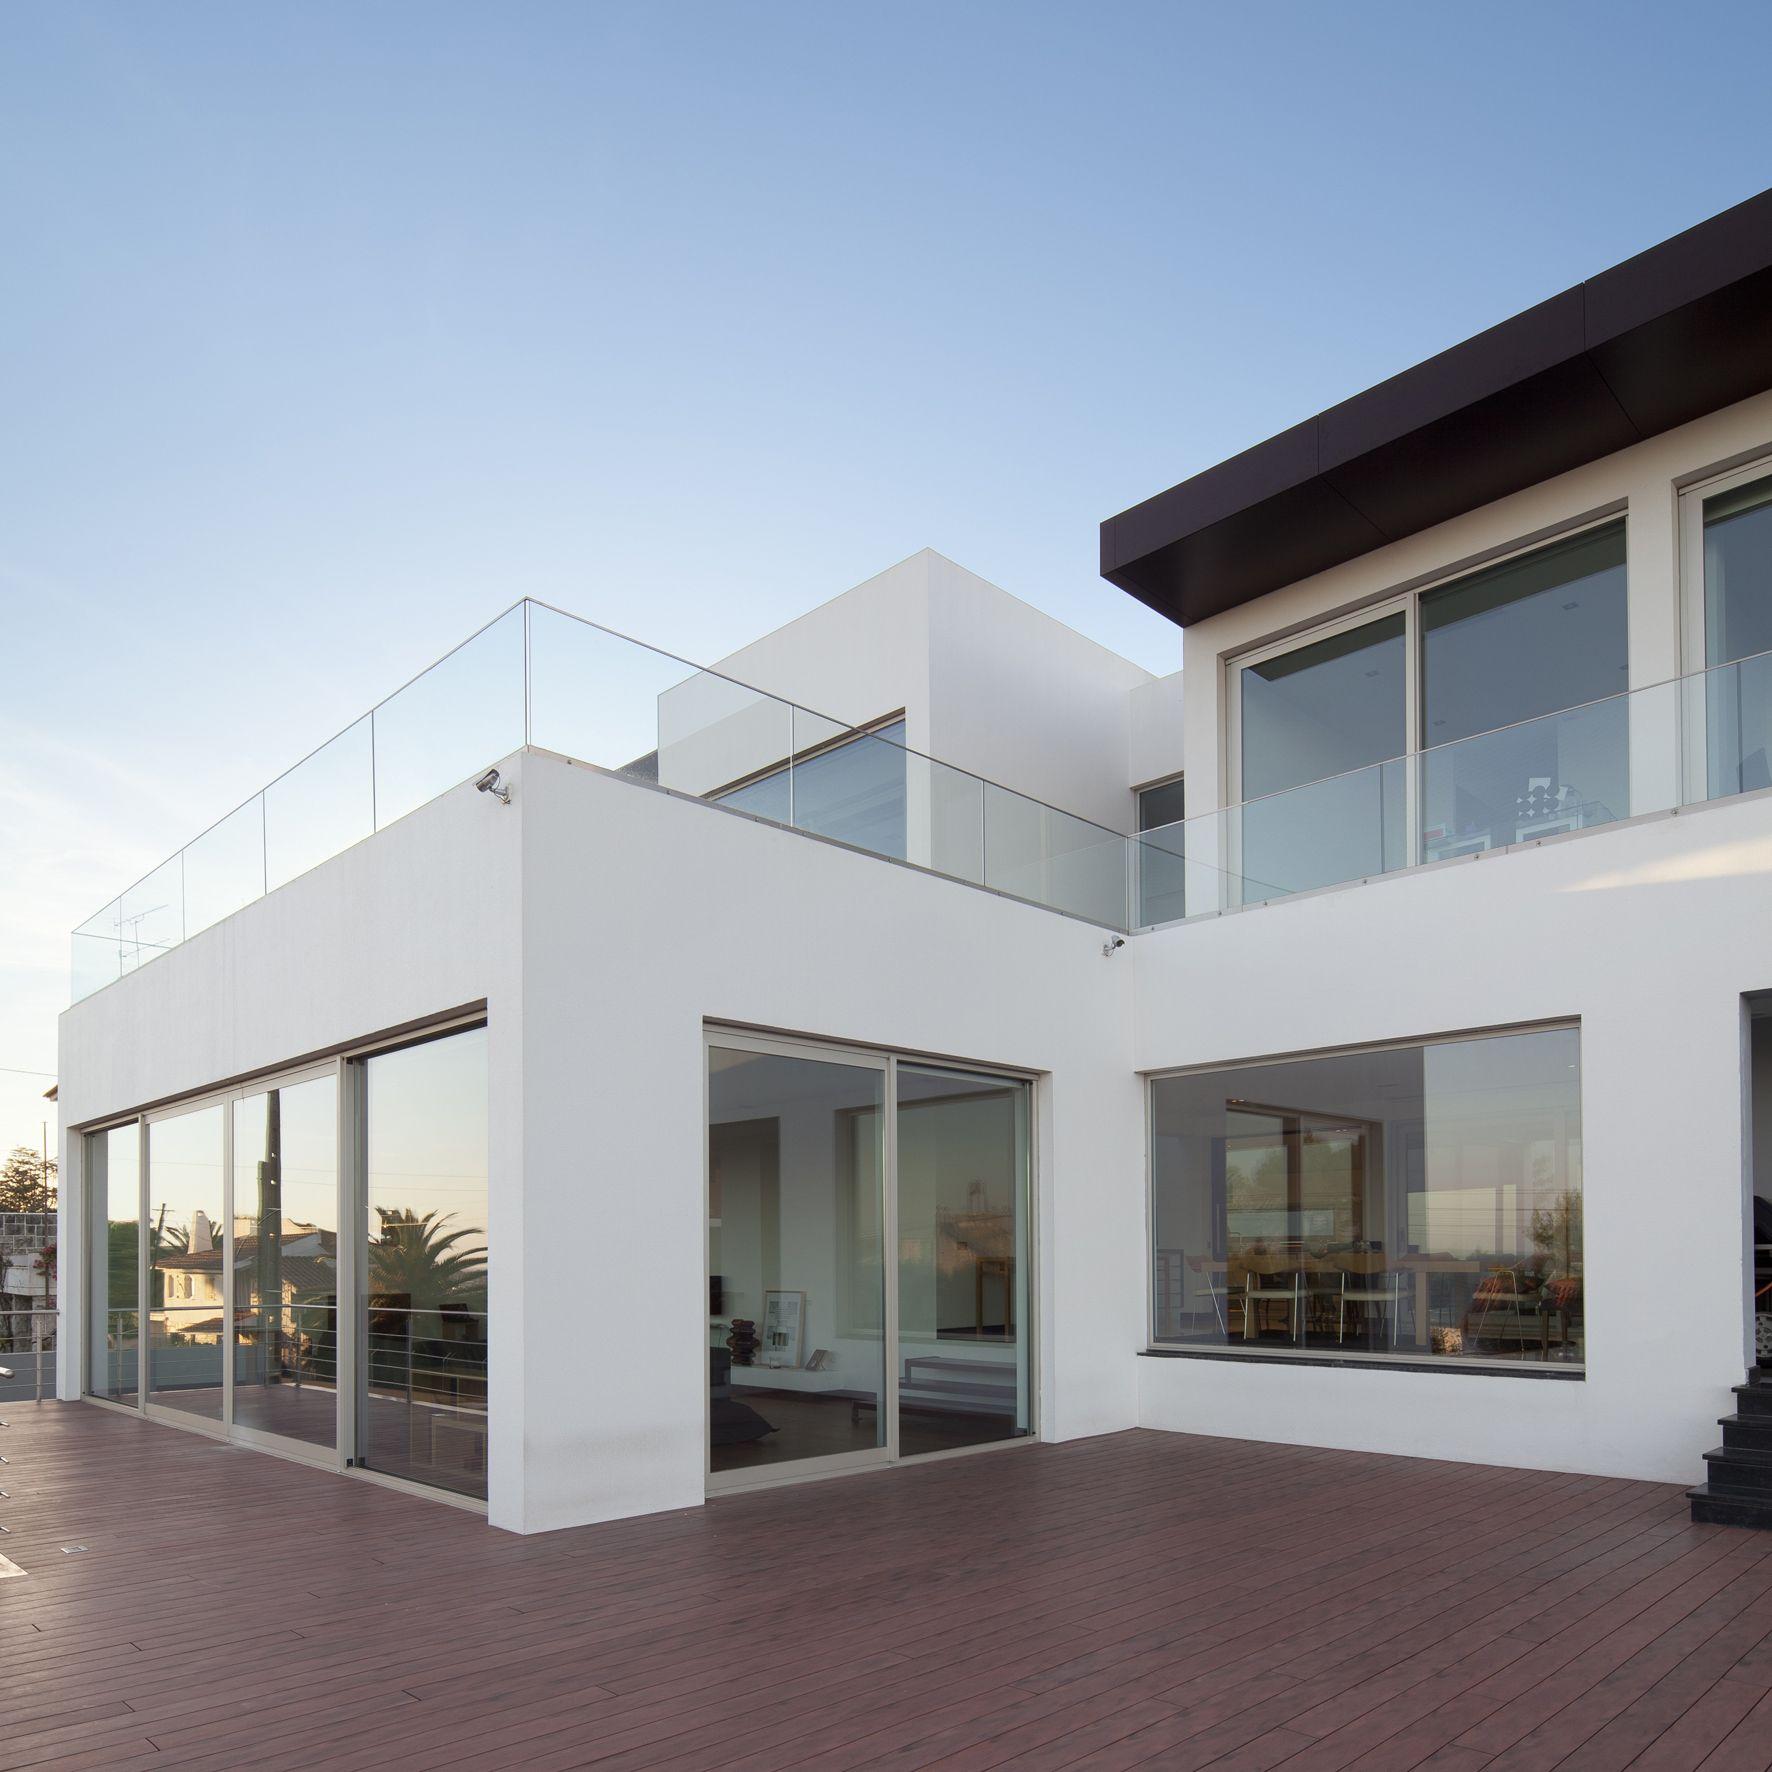 menuiseries aluminium kawneer villa carlos portugal. Black Bedroom Furniture Sets. Home Design Ideas